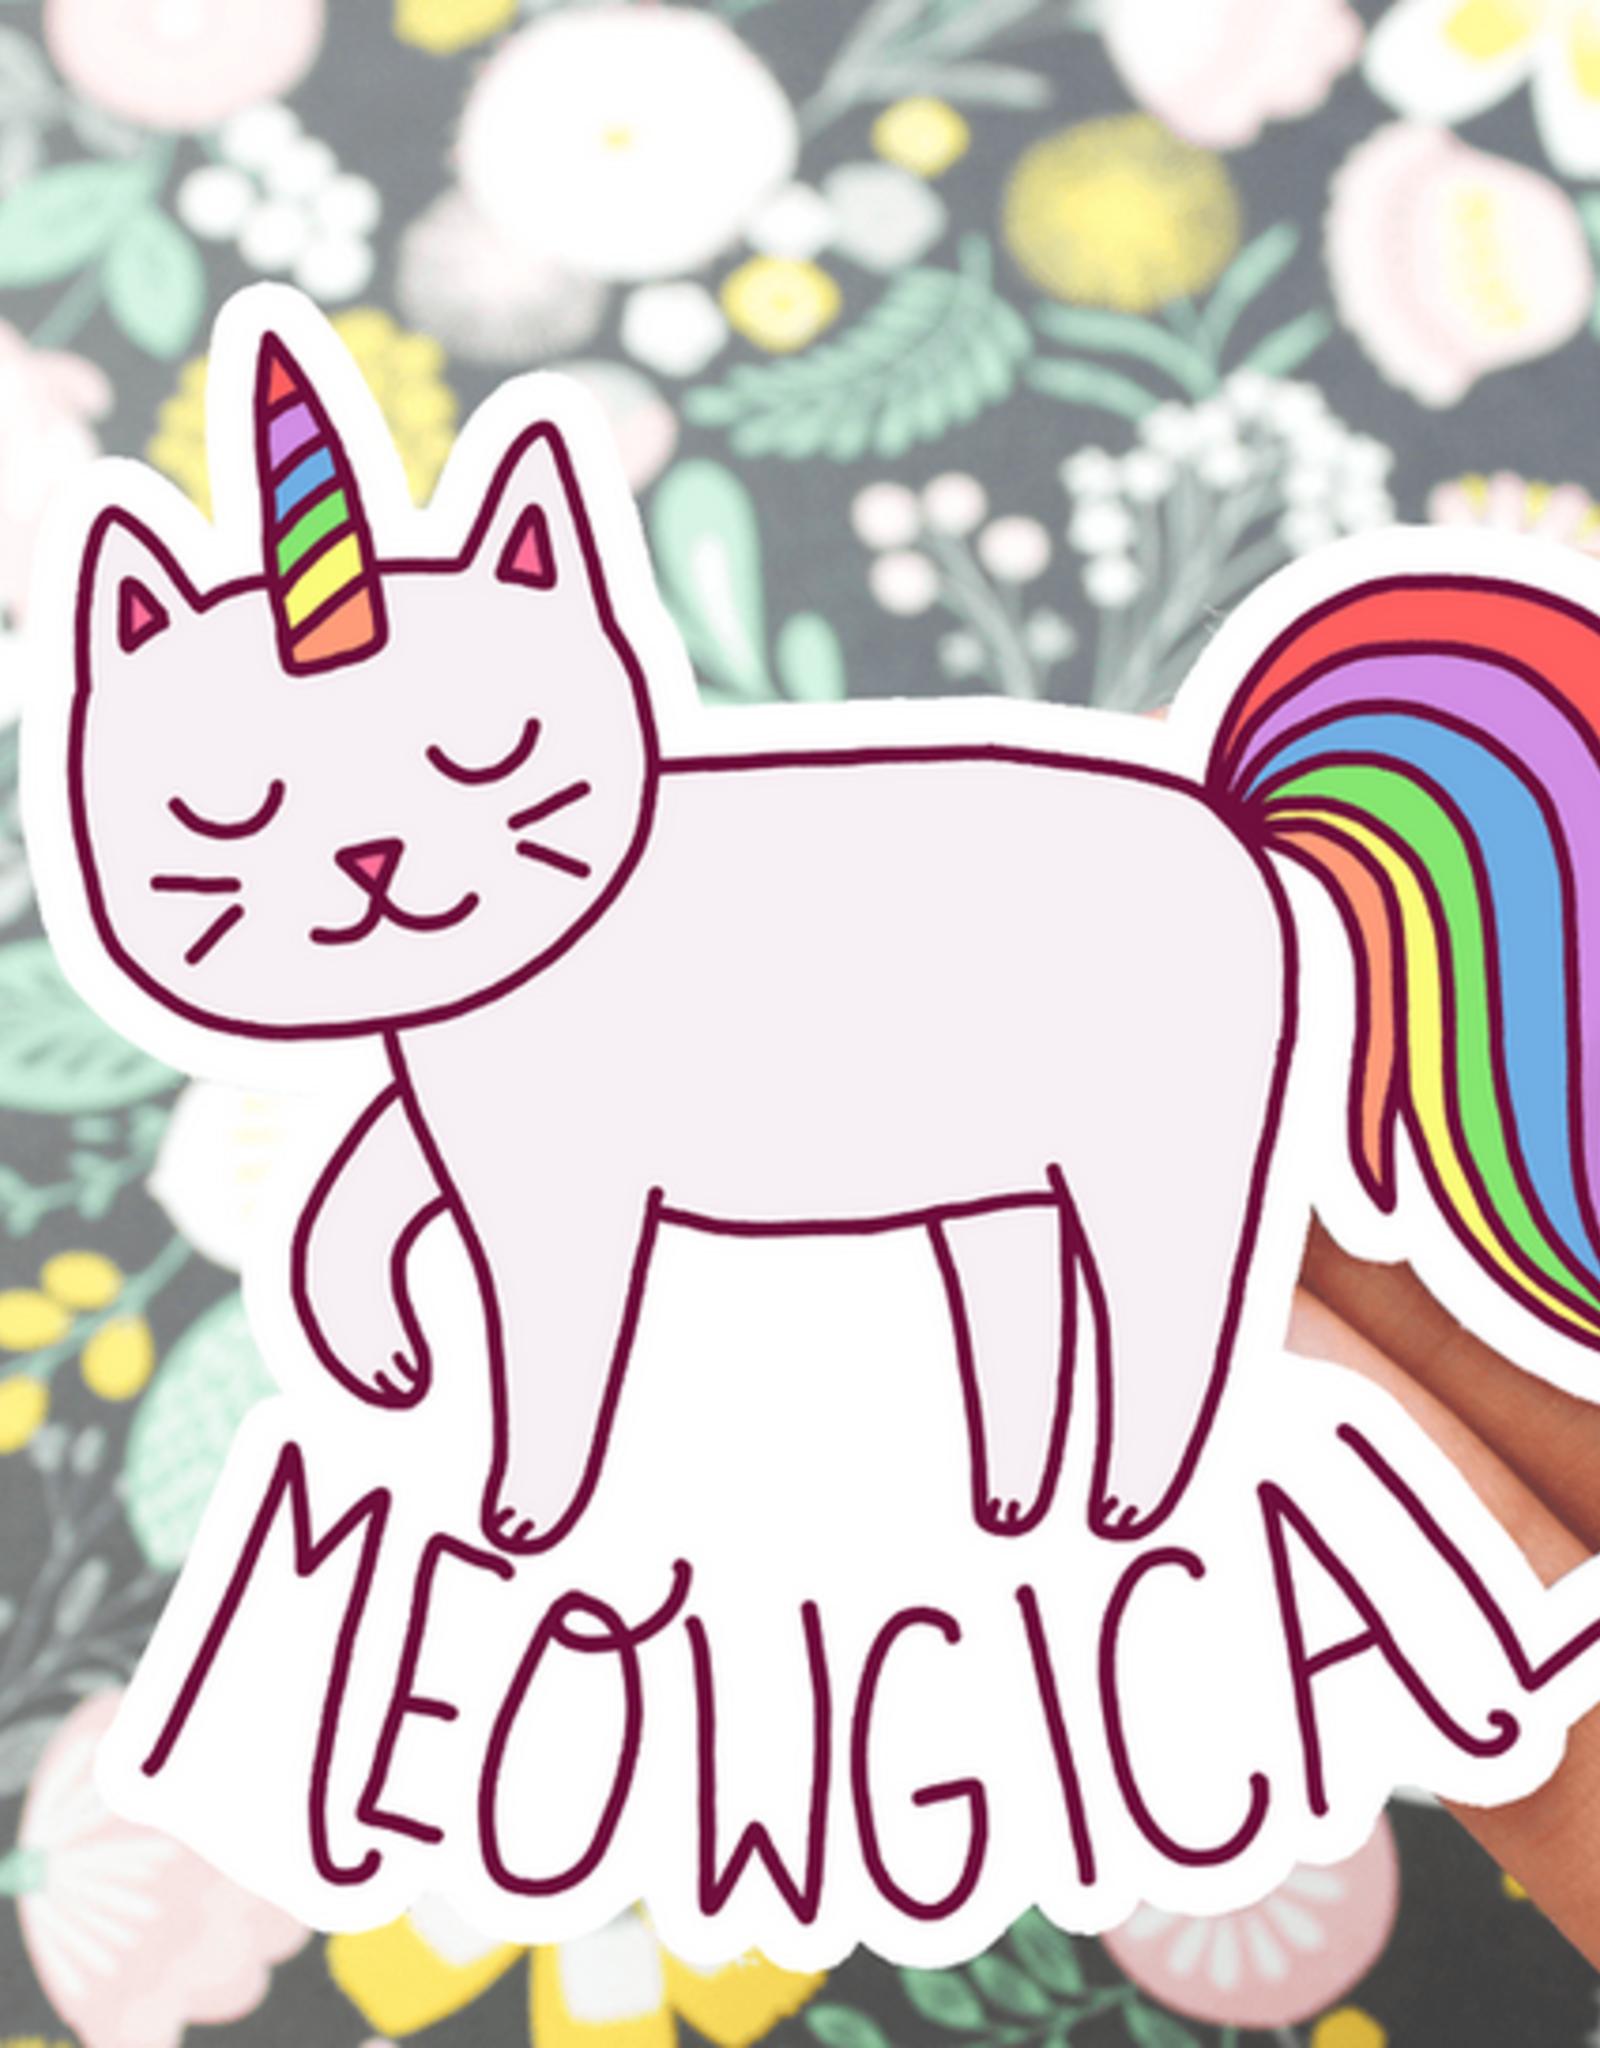 Turtle's Soup Meowgical Cat Vinyl Sticker